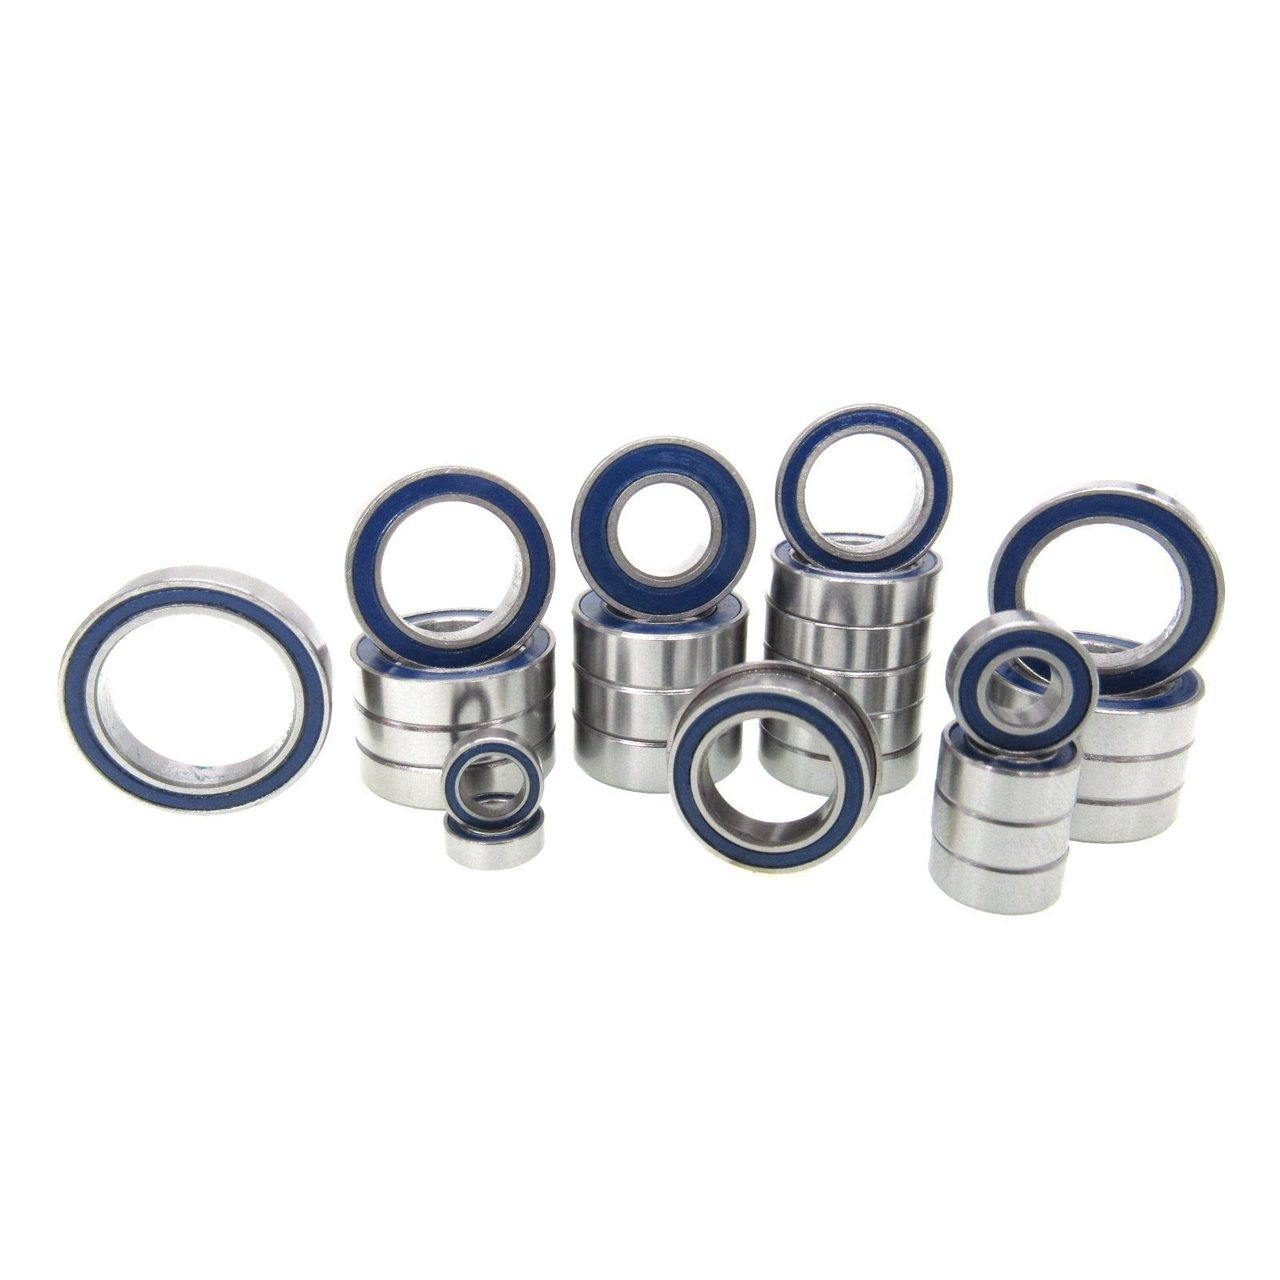 Arrma Kraton 4S BLX Precision Bearing Kit Rubber Seals Blue (26)